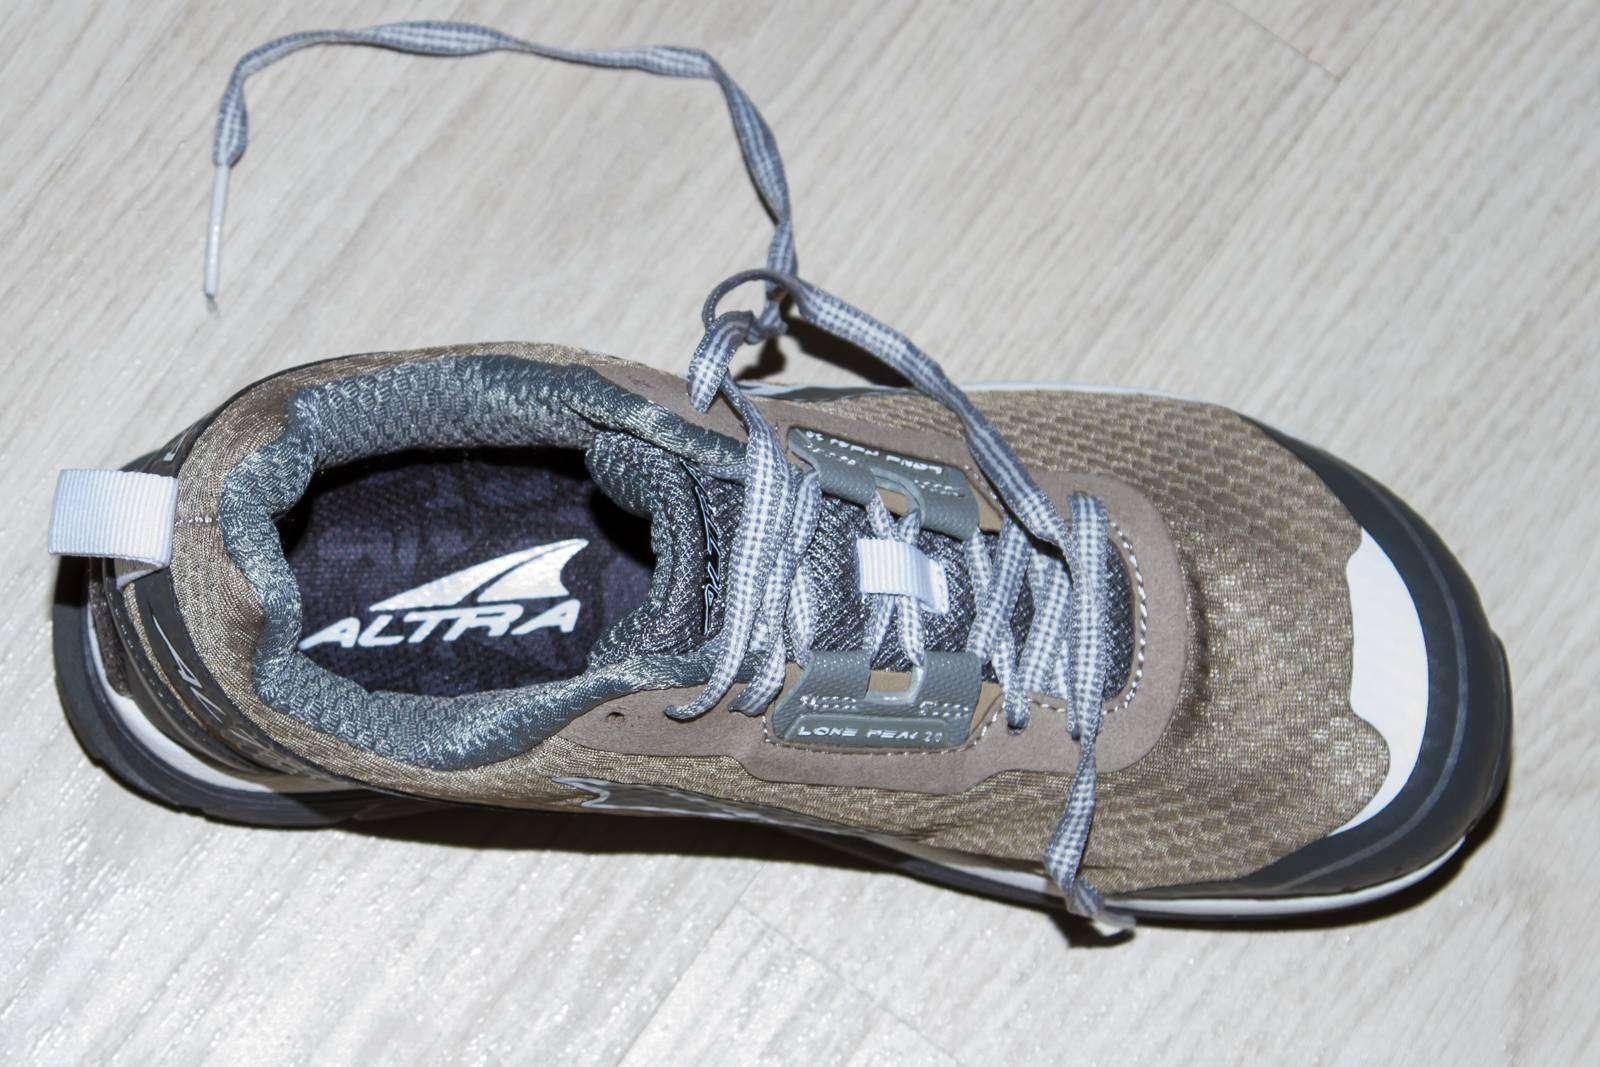 6pm: Беговые женские кроссовки Altra Footwear Lone Peak 2